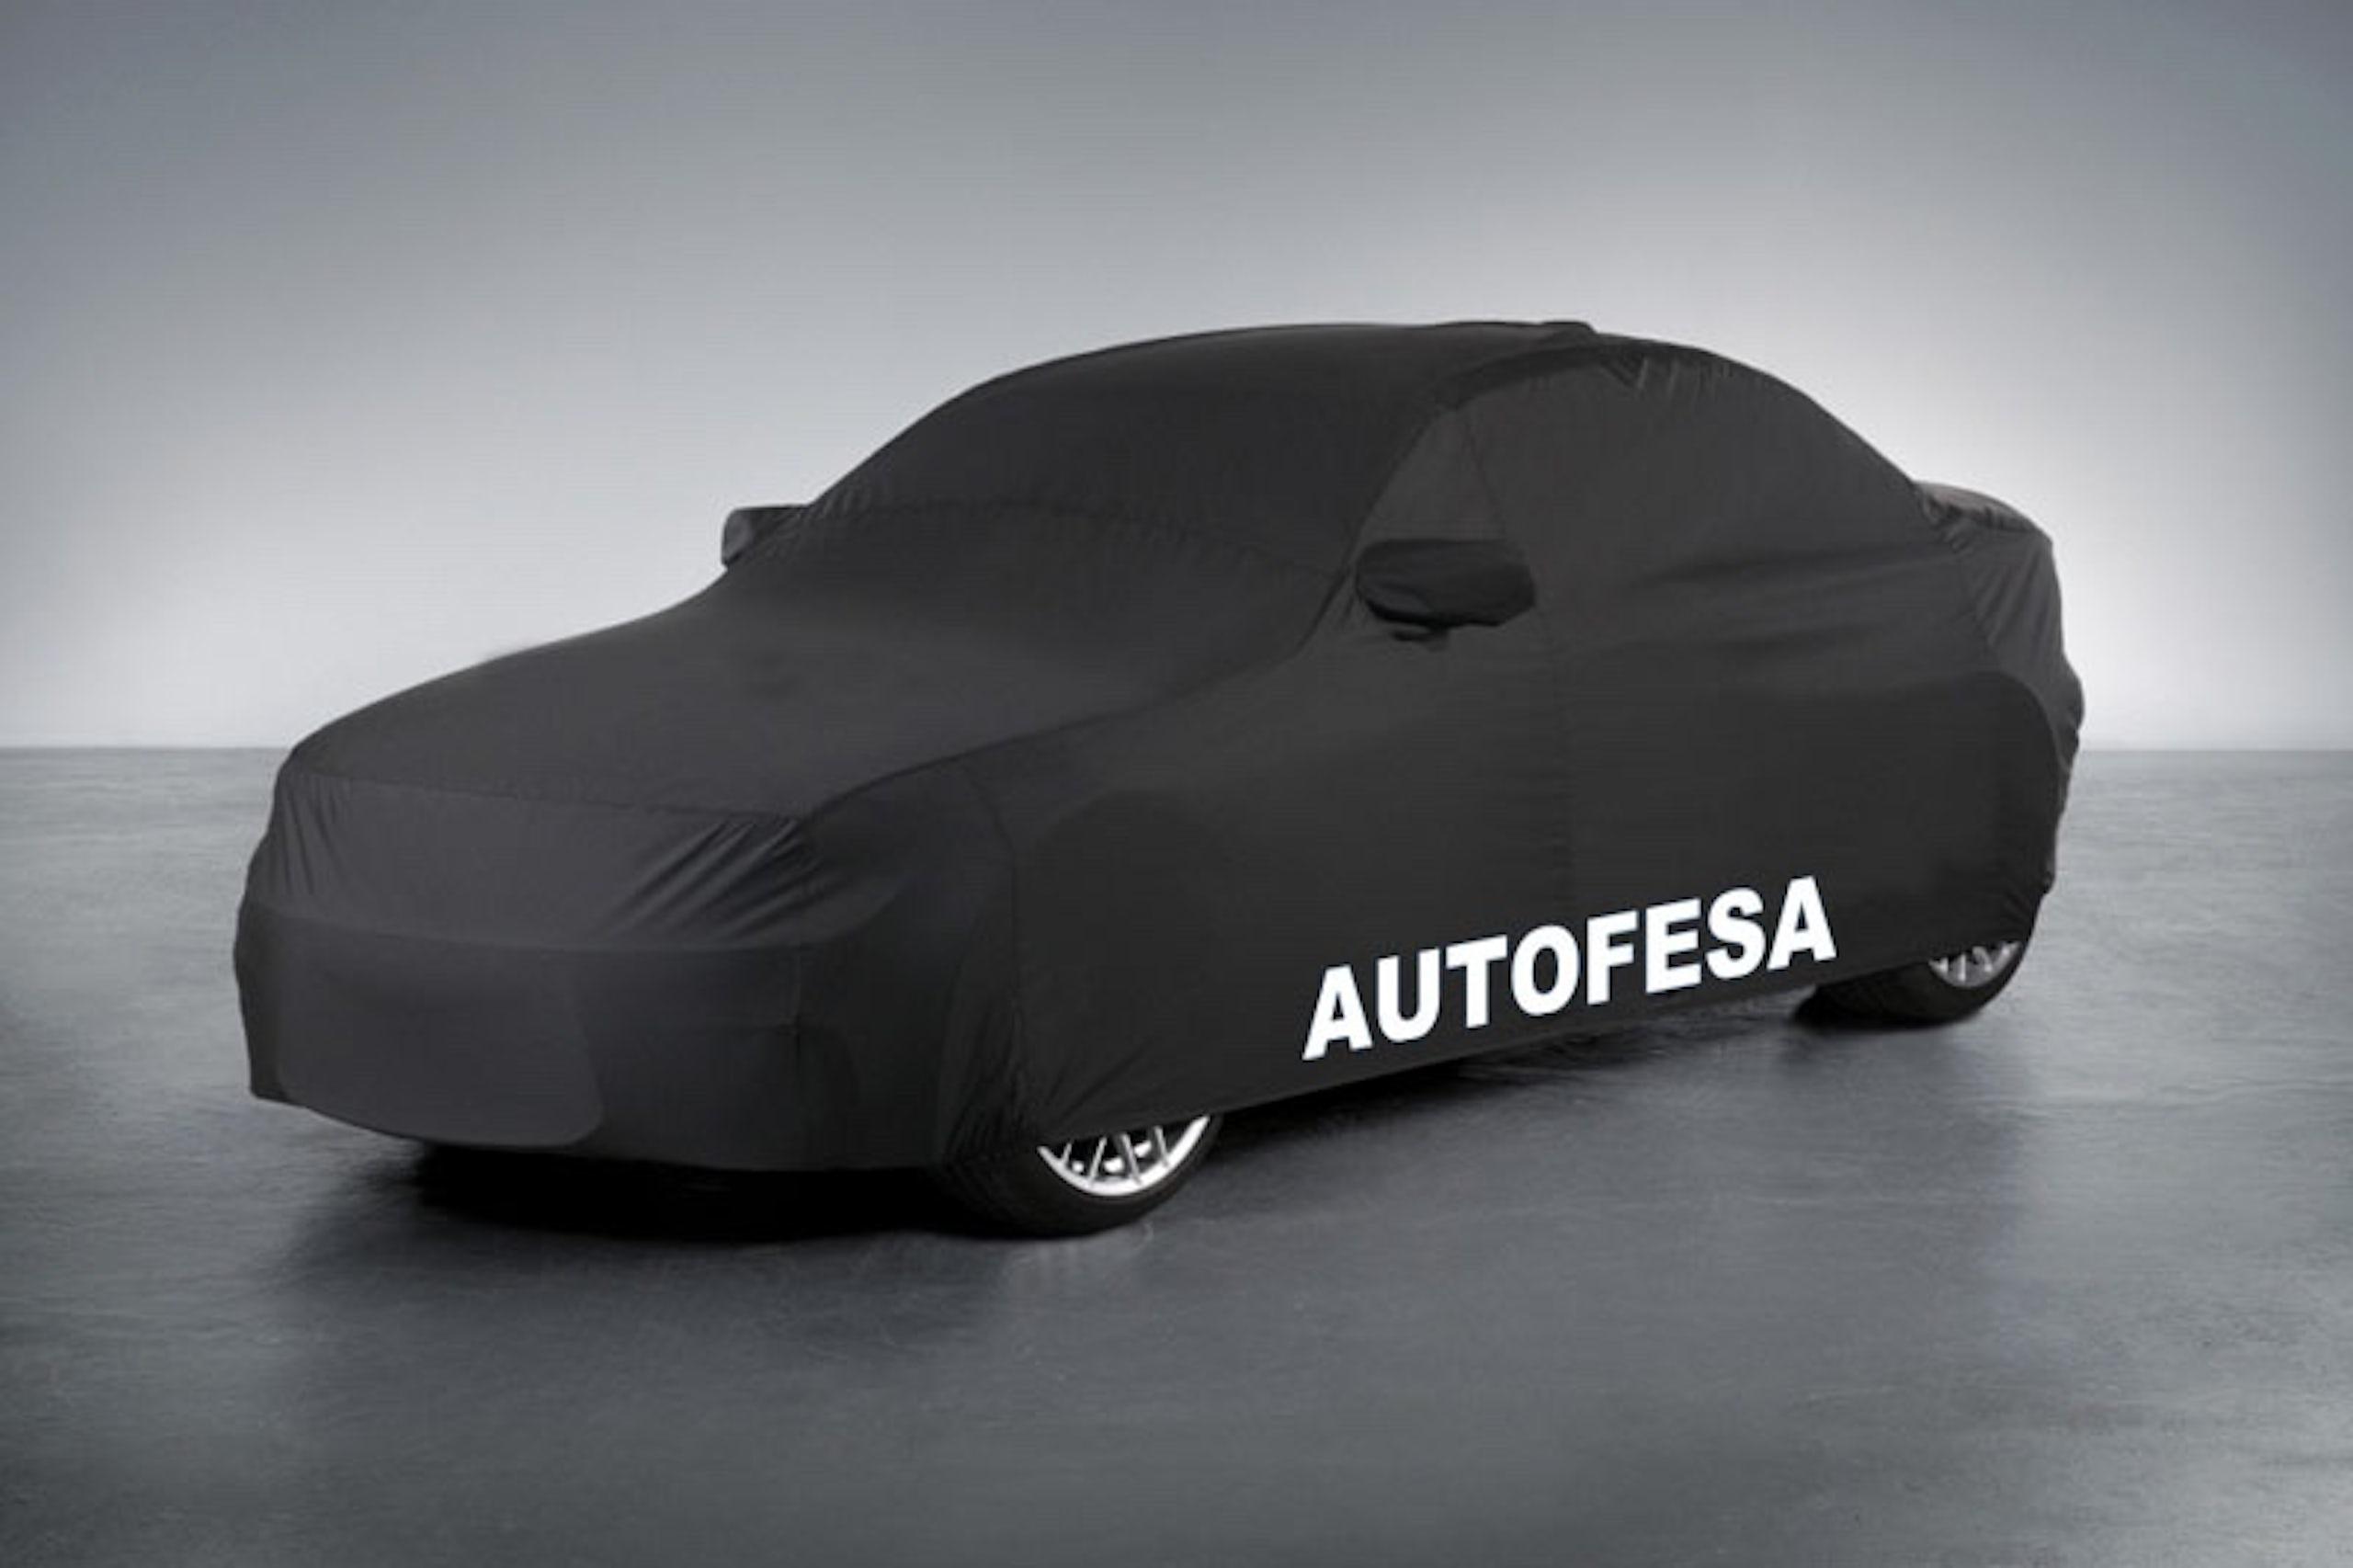 Ford Mondeo 2.0 TDCi 150cv Trend 5p Powershift Auto S/S - Foto 29